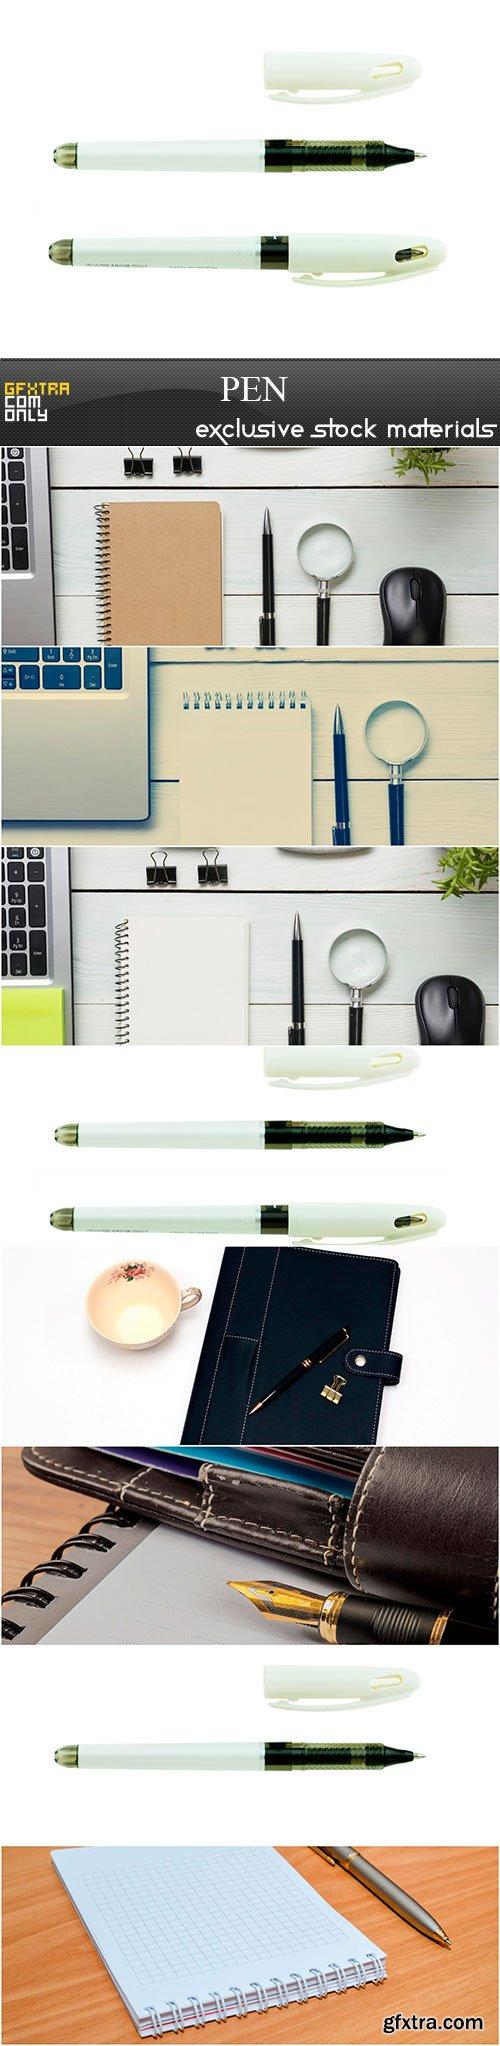 Pen, 8 x UHQ JPEG